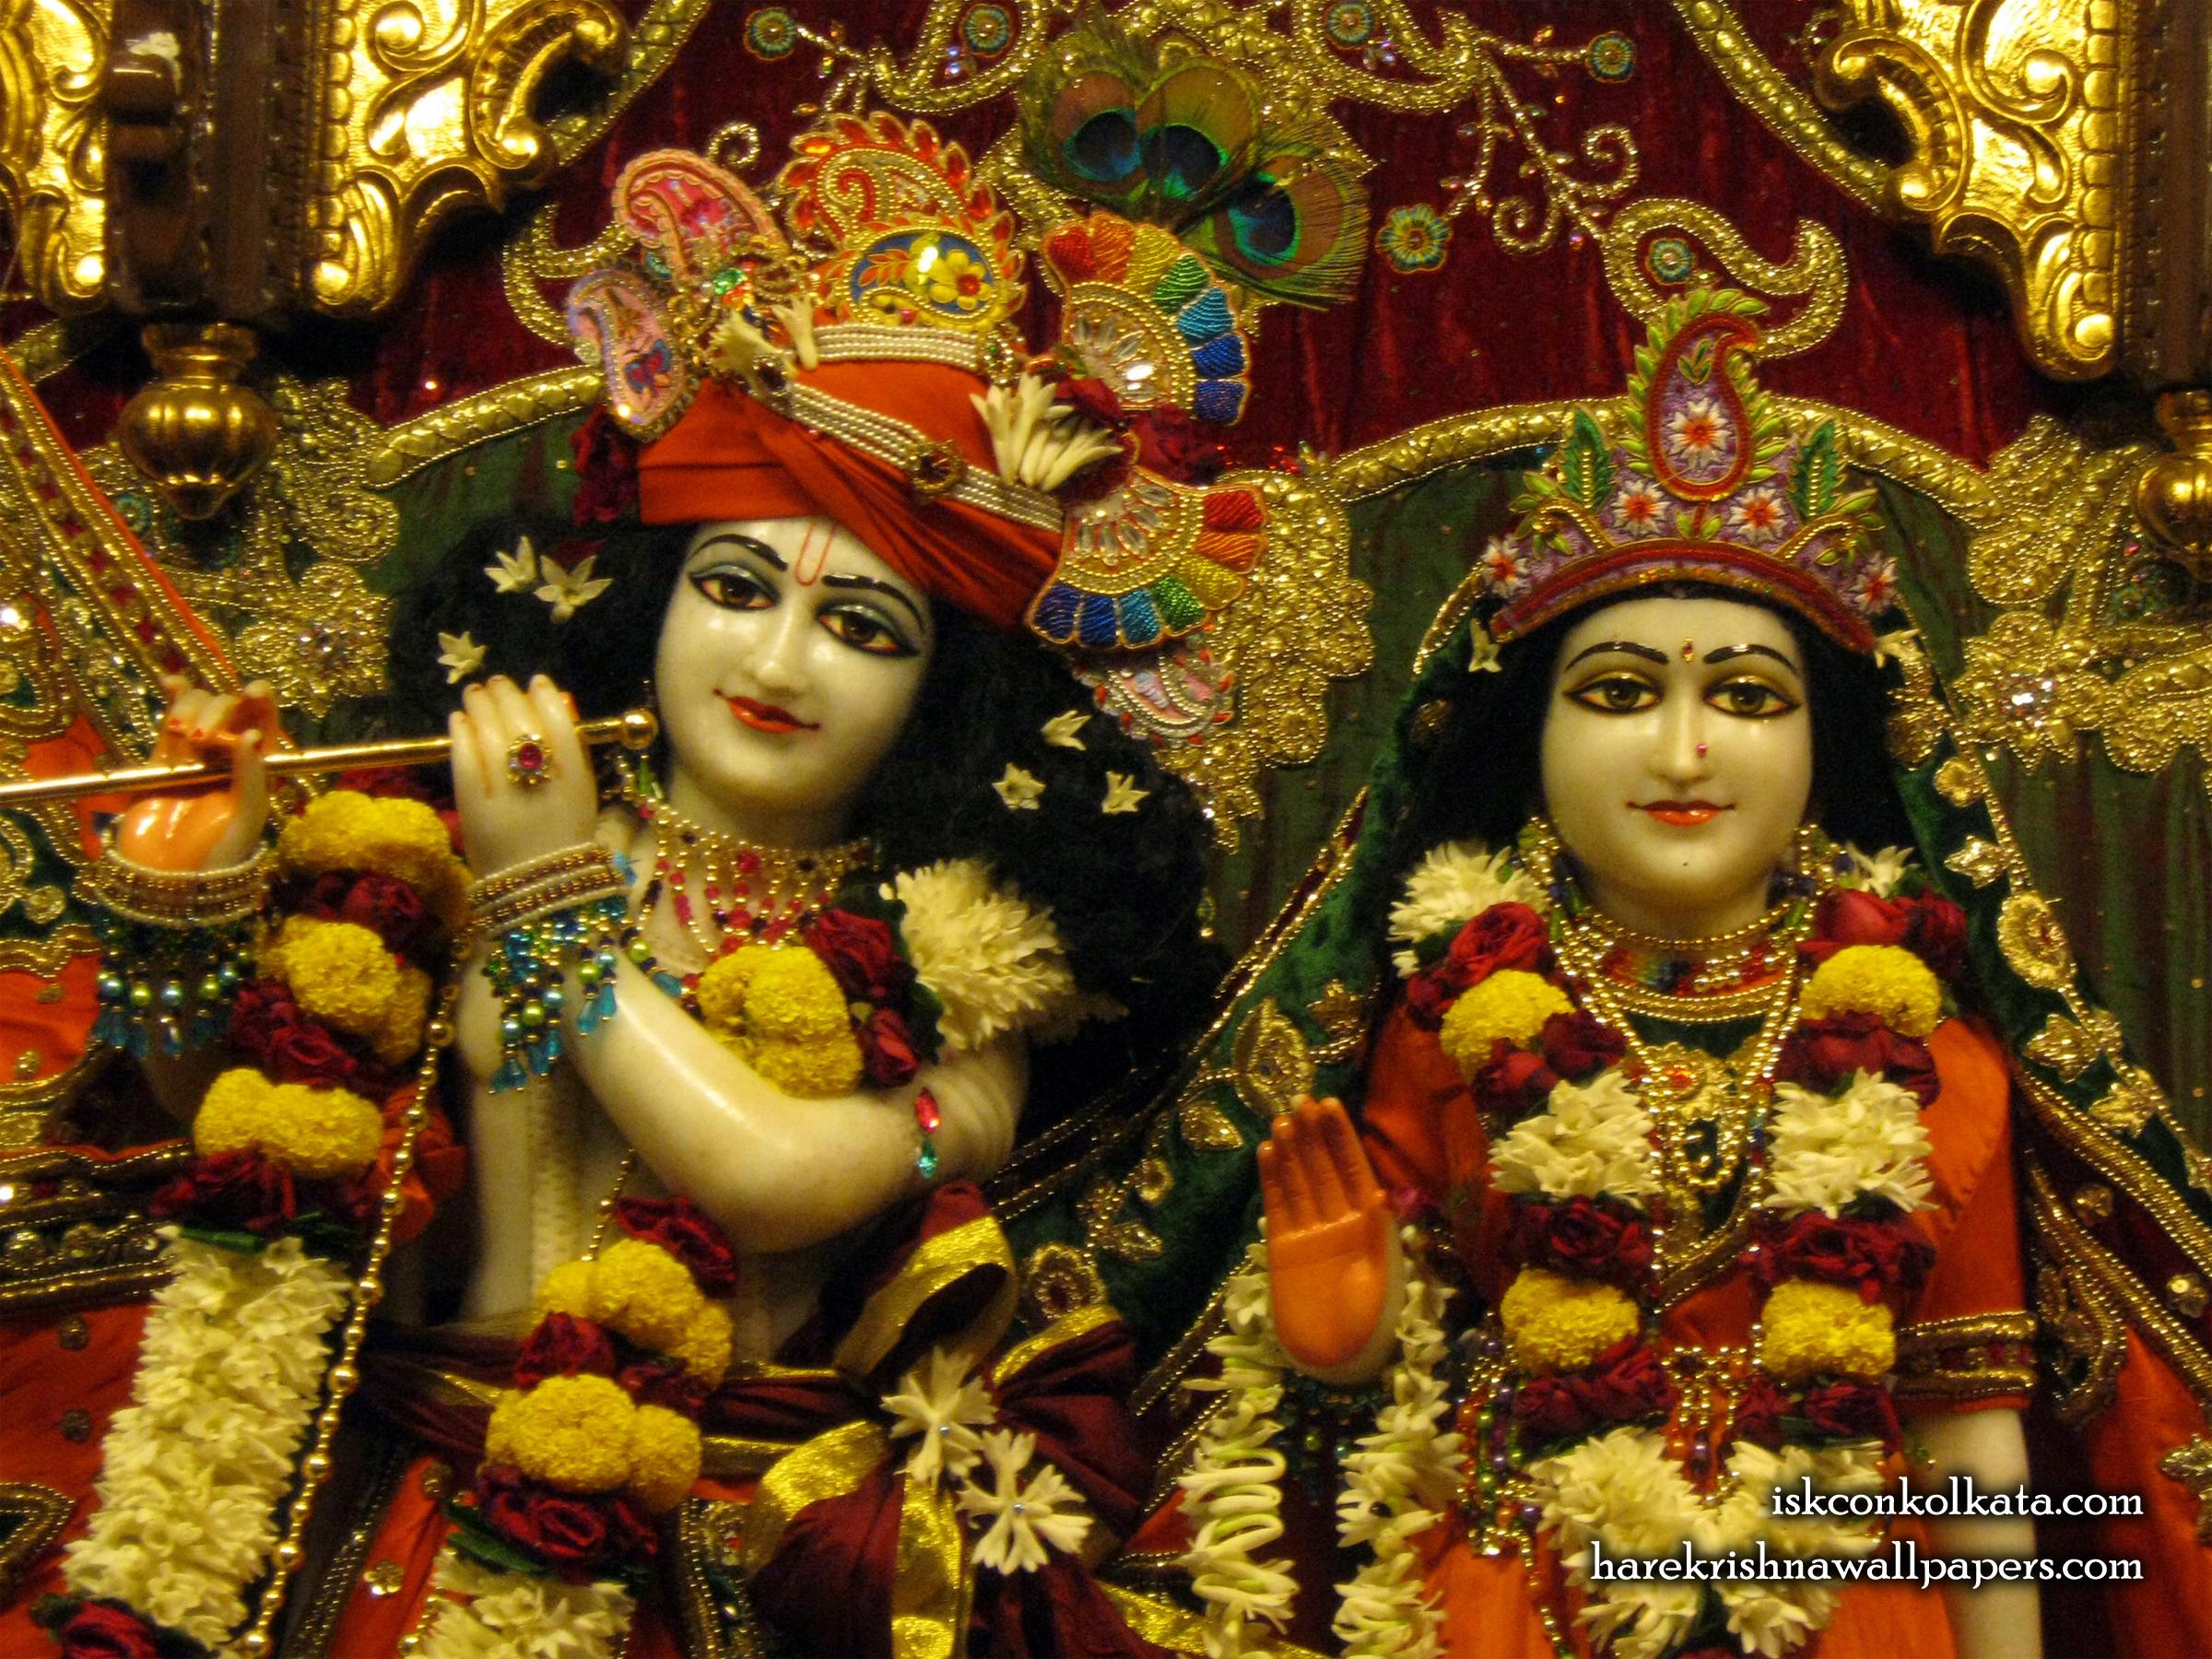 Sri Sri Radha Govinda Close up Wallpaper (002) Size 2400x1800 Download